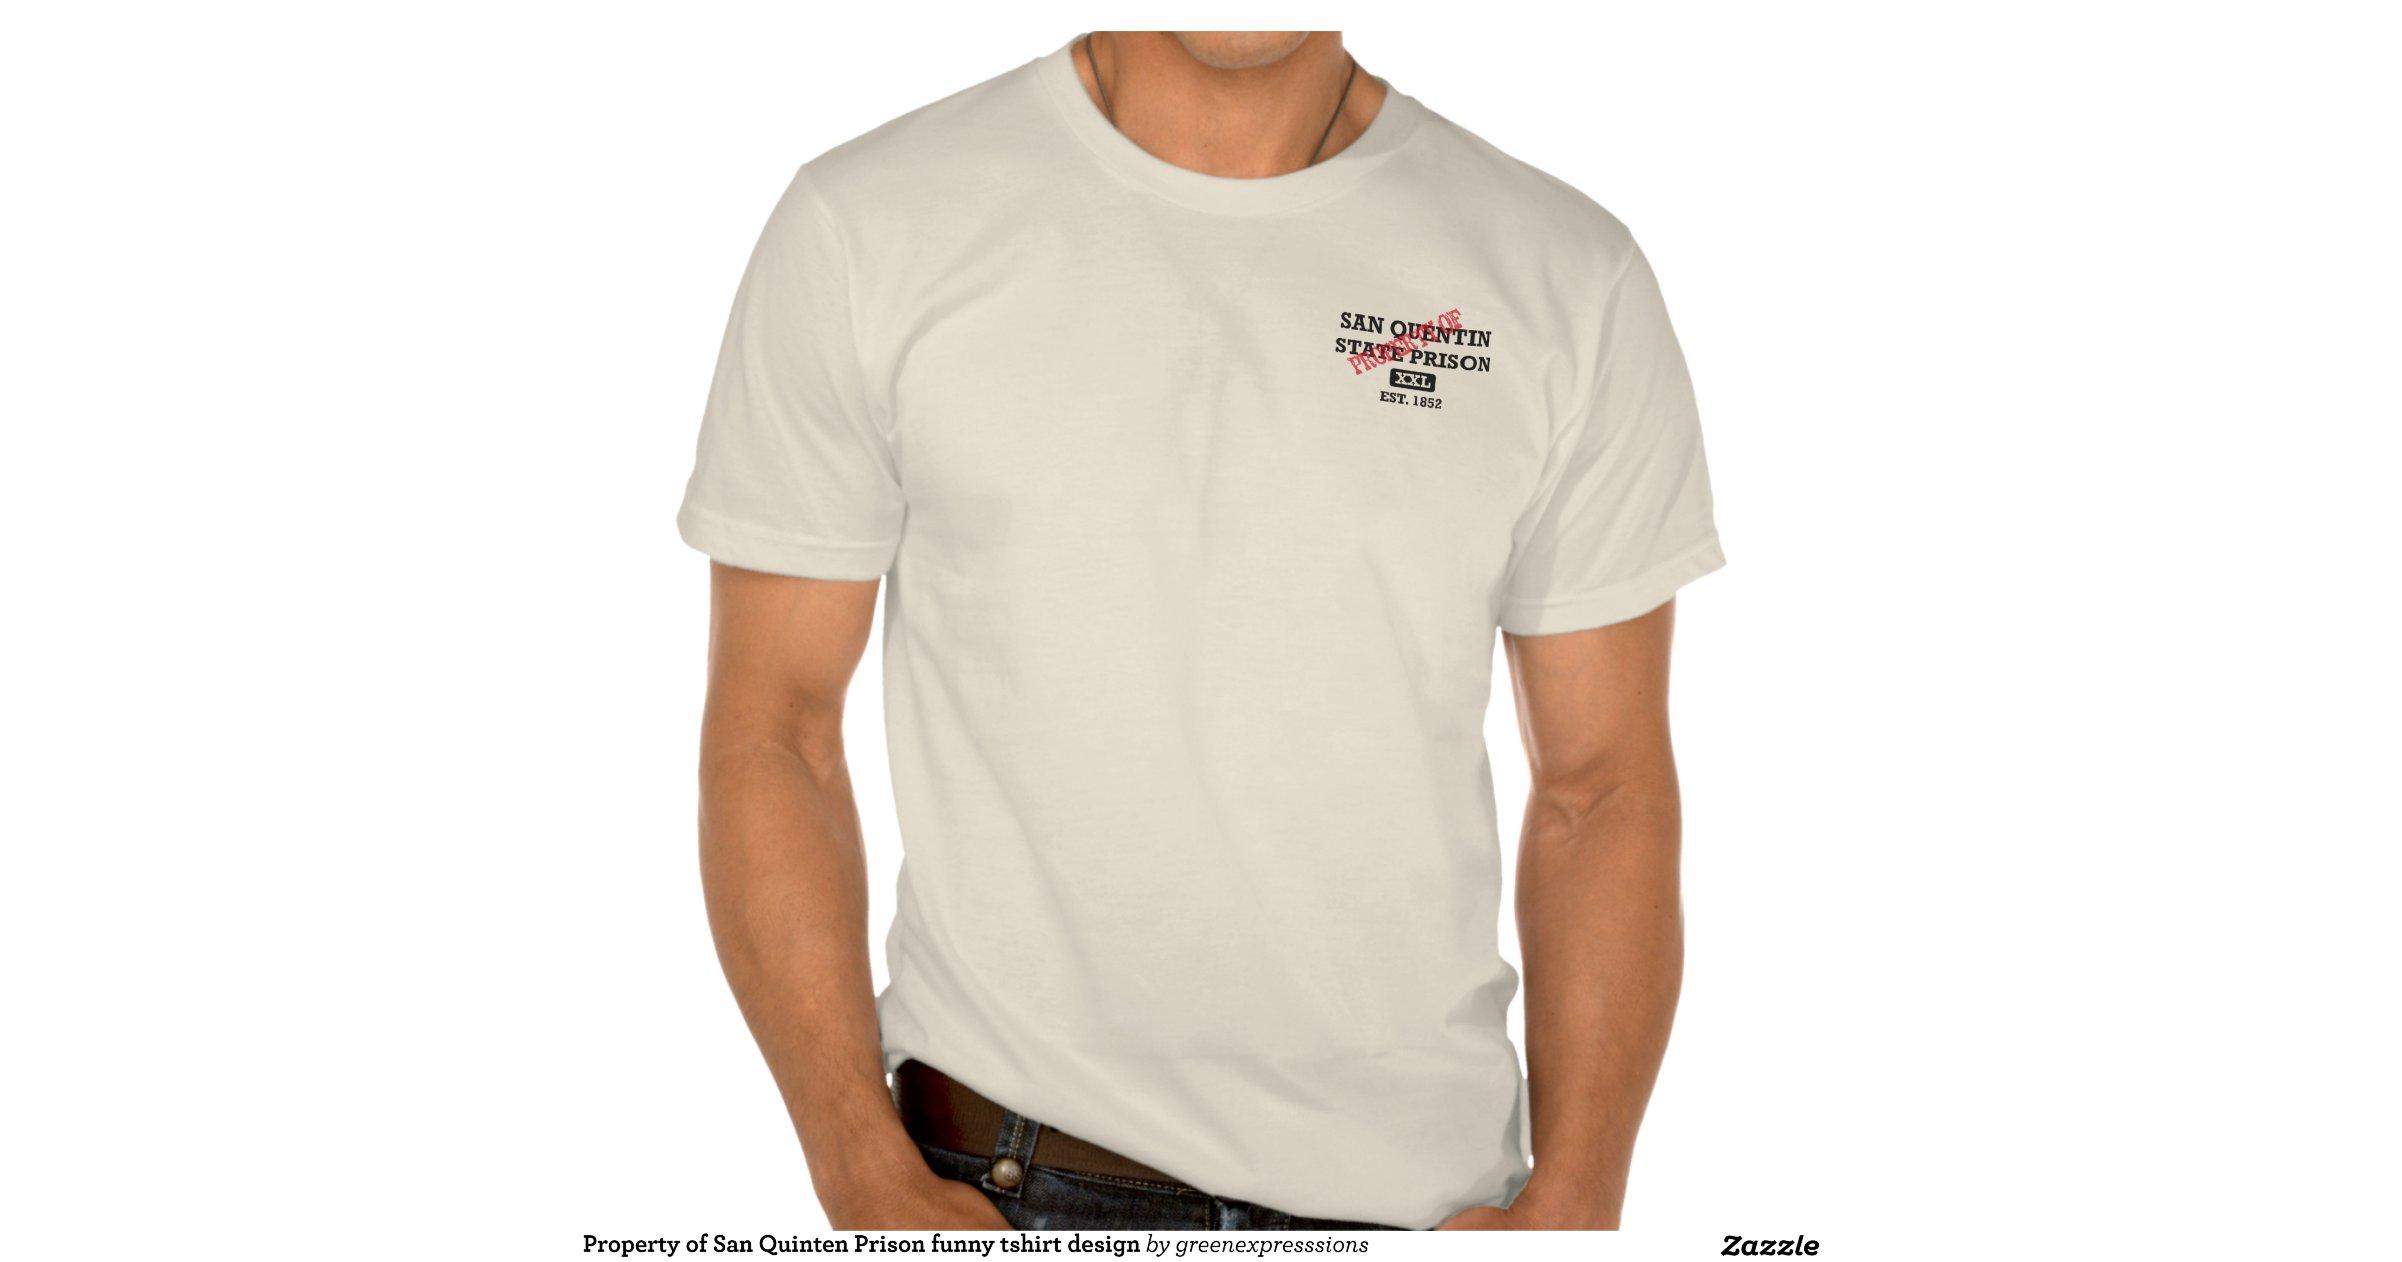 Property of san quinten prison funny tshirt design zazzle for Property of shirt designs